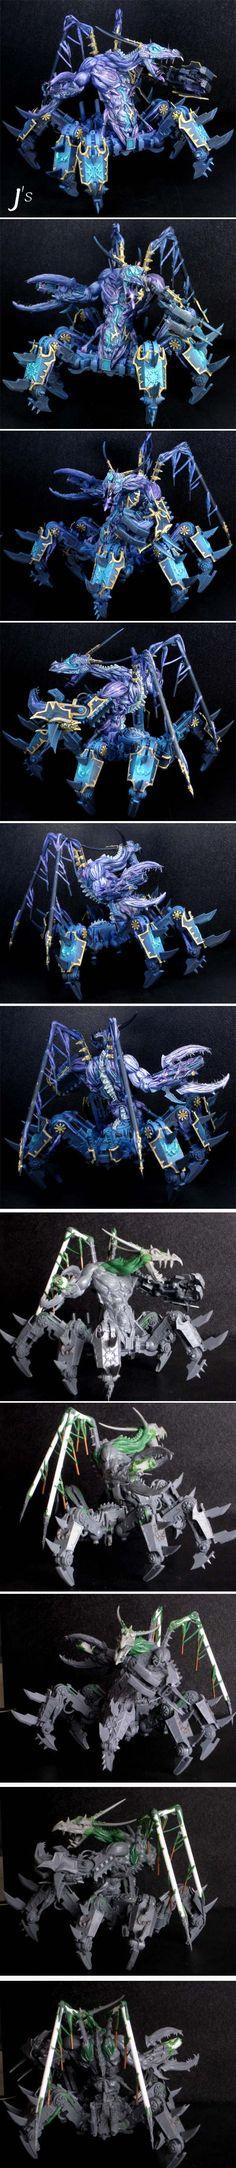 CoolMiniOrNot - J's Thousand Sons Defiler - Tzeentch Soul Grinder Figurine Warhammer, Warhammer Art, Warhammer Models, Warhammer 40k Miniatures, Warhammer Fantasy, Warhammer 40000, Chaos 40k, Chaos Daemons, Thousand Sons